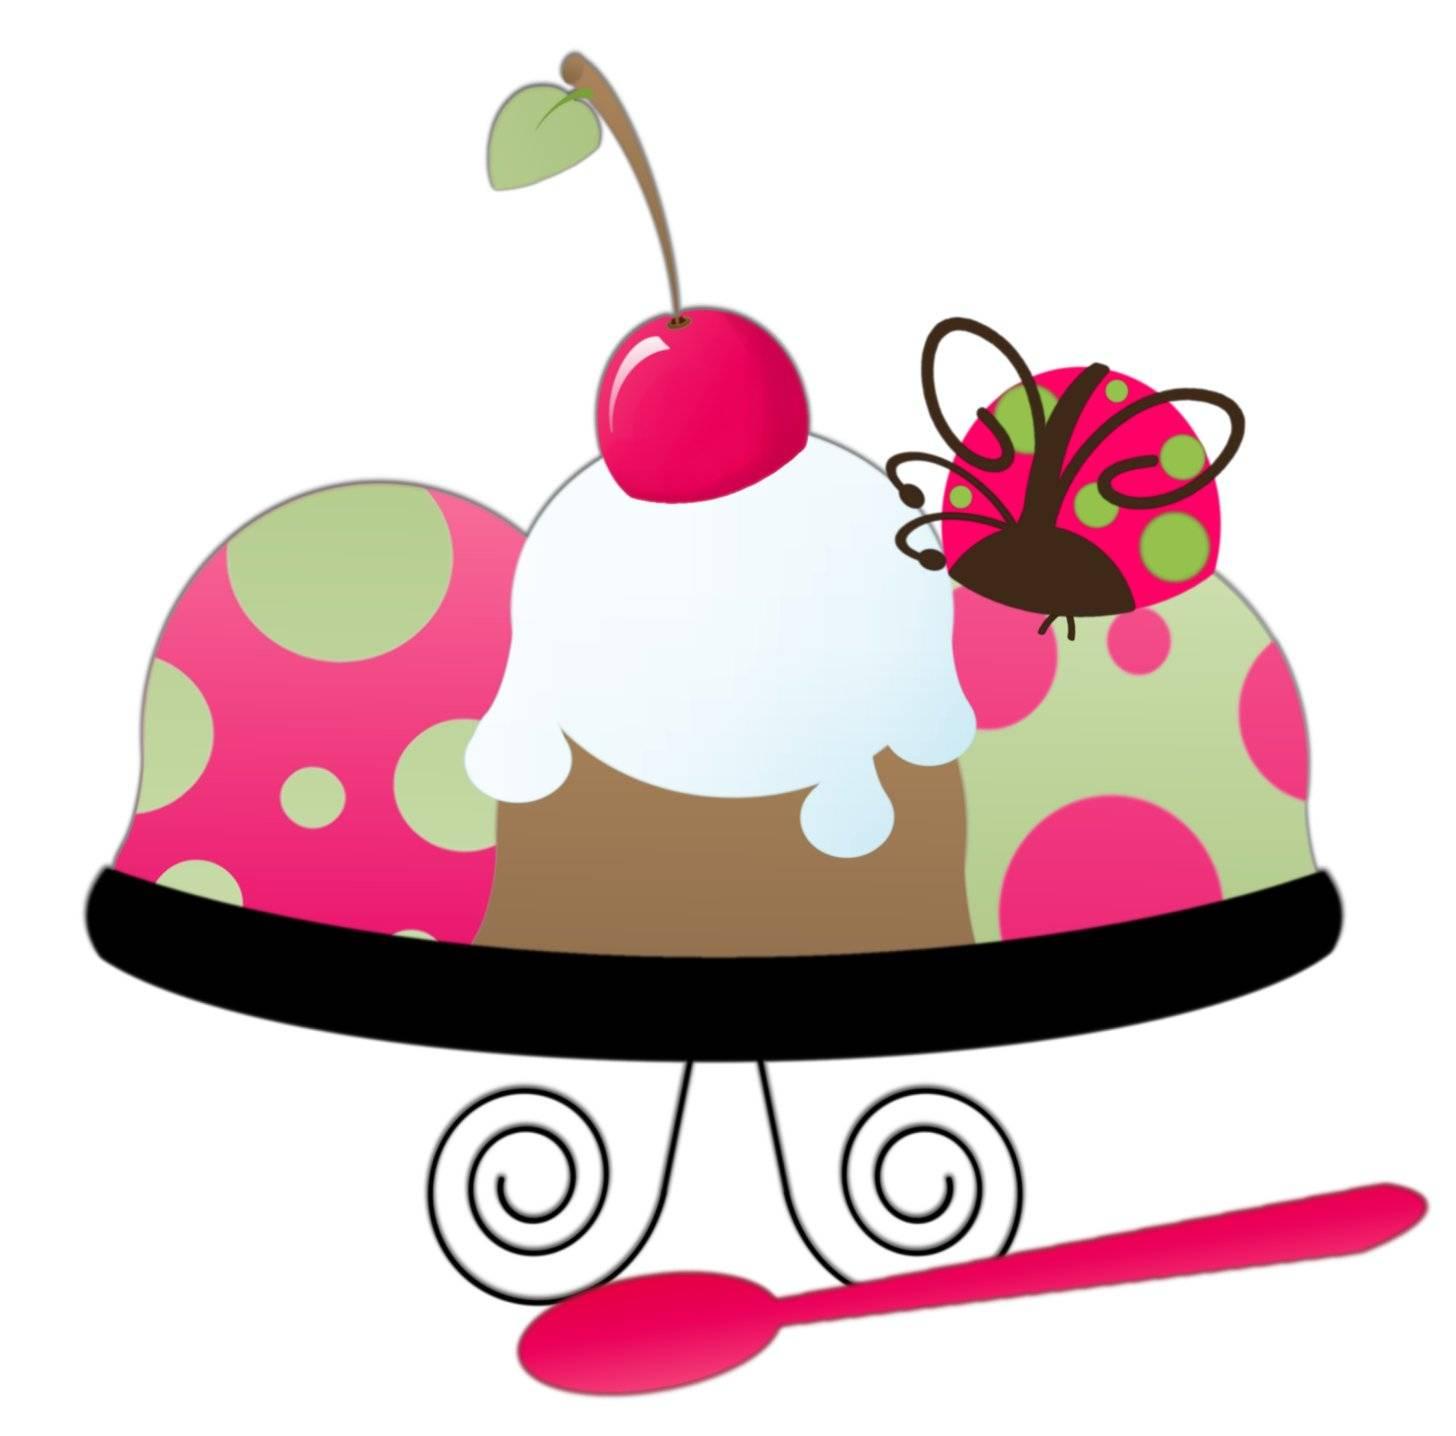 Ice Cream Sundae Clip Art | Clipart Panda - Free Clipart ...